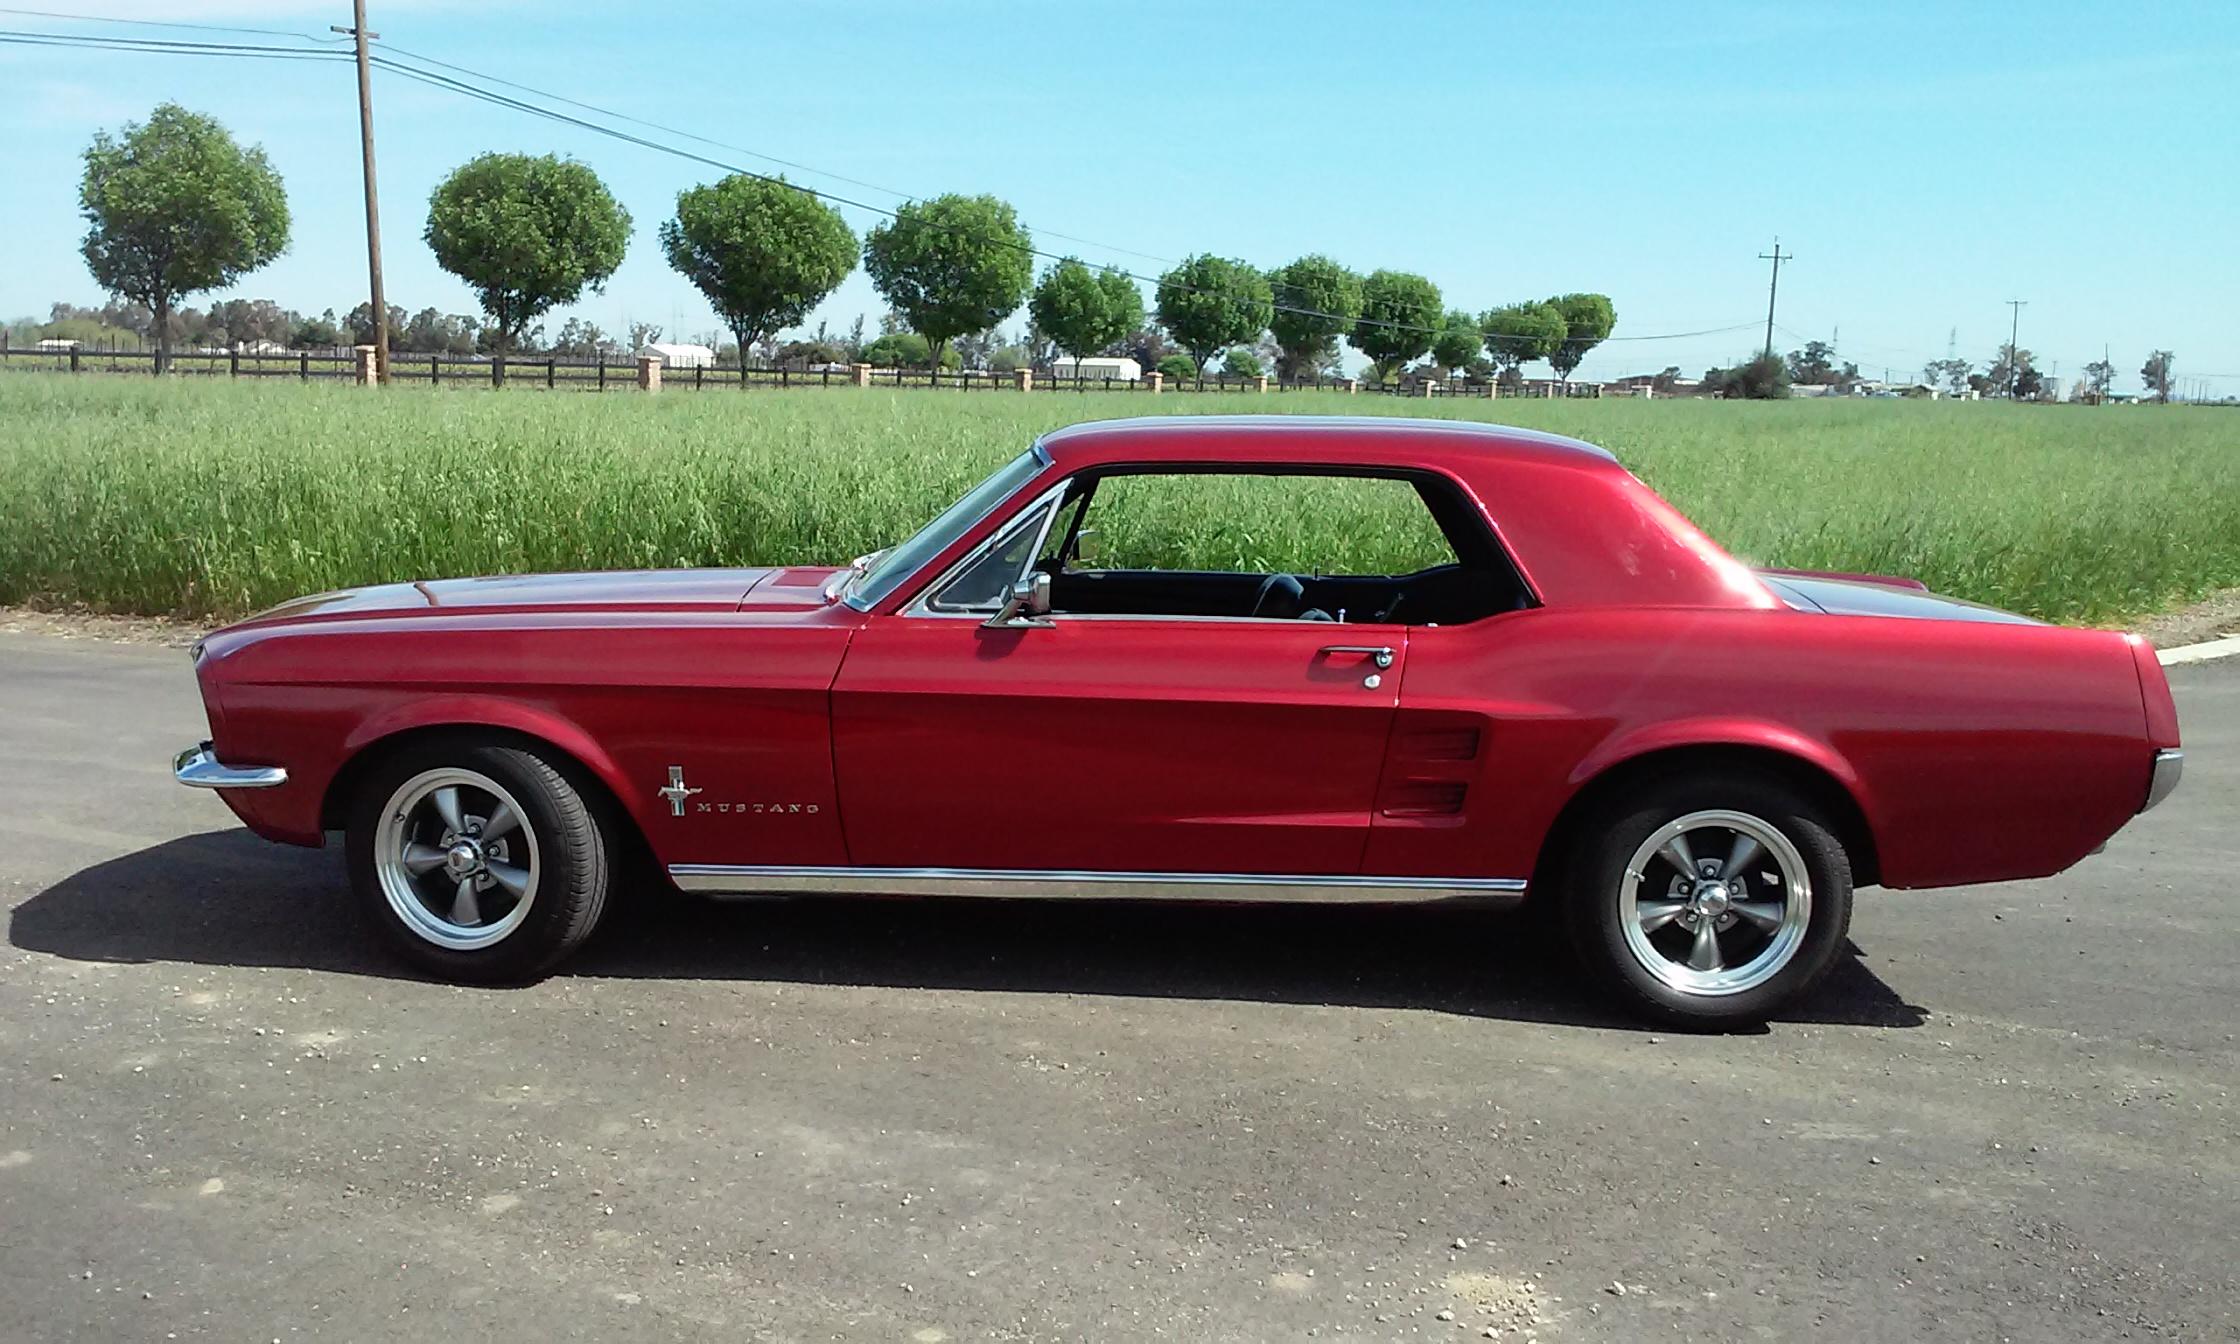 Mustang 67 Colors